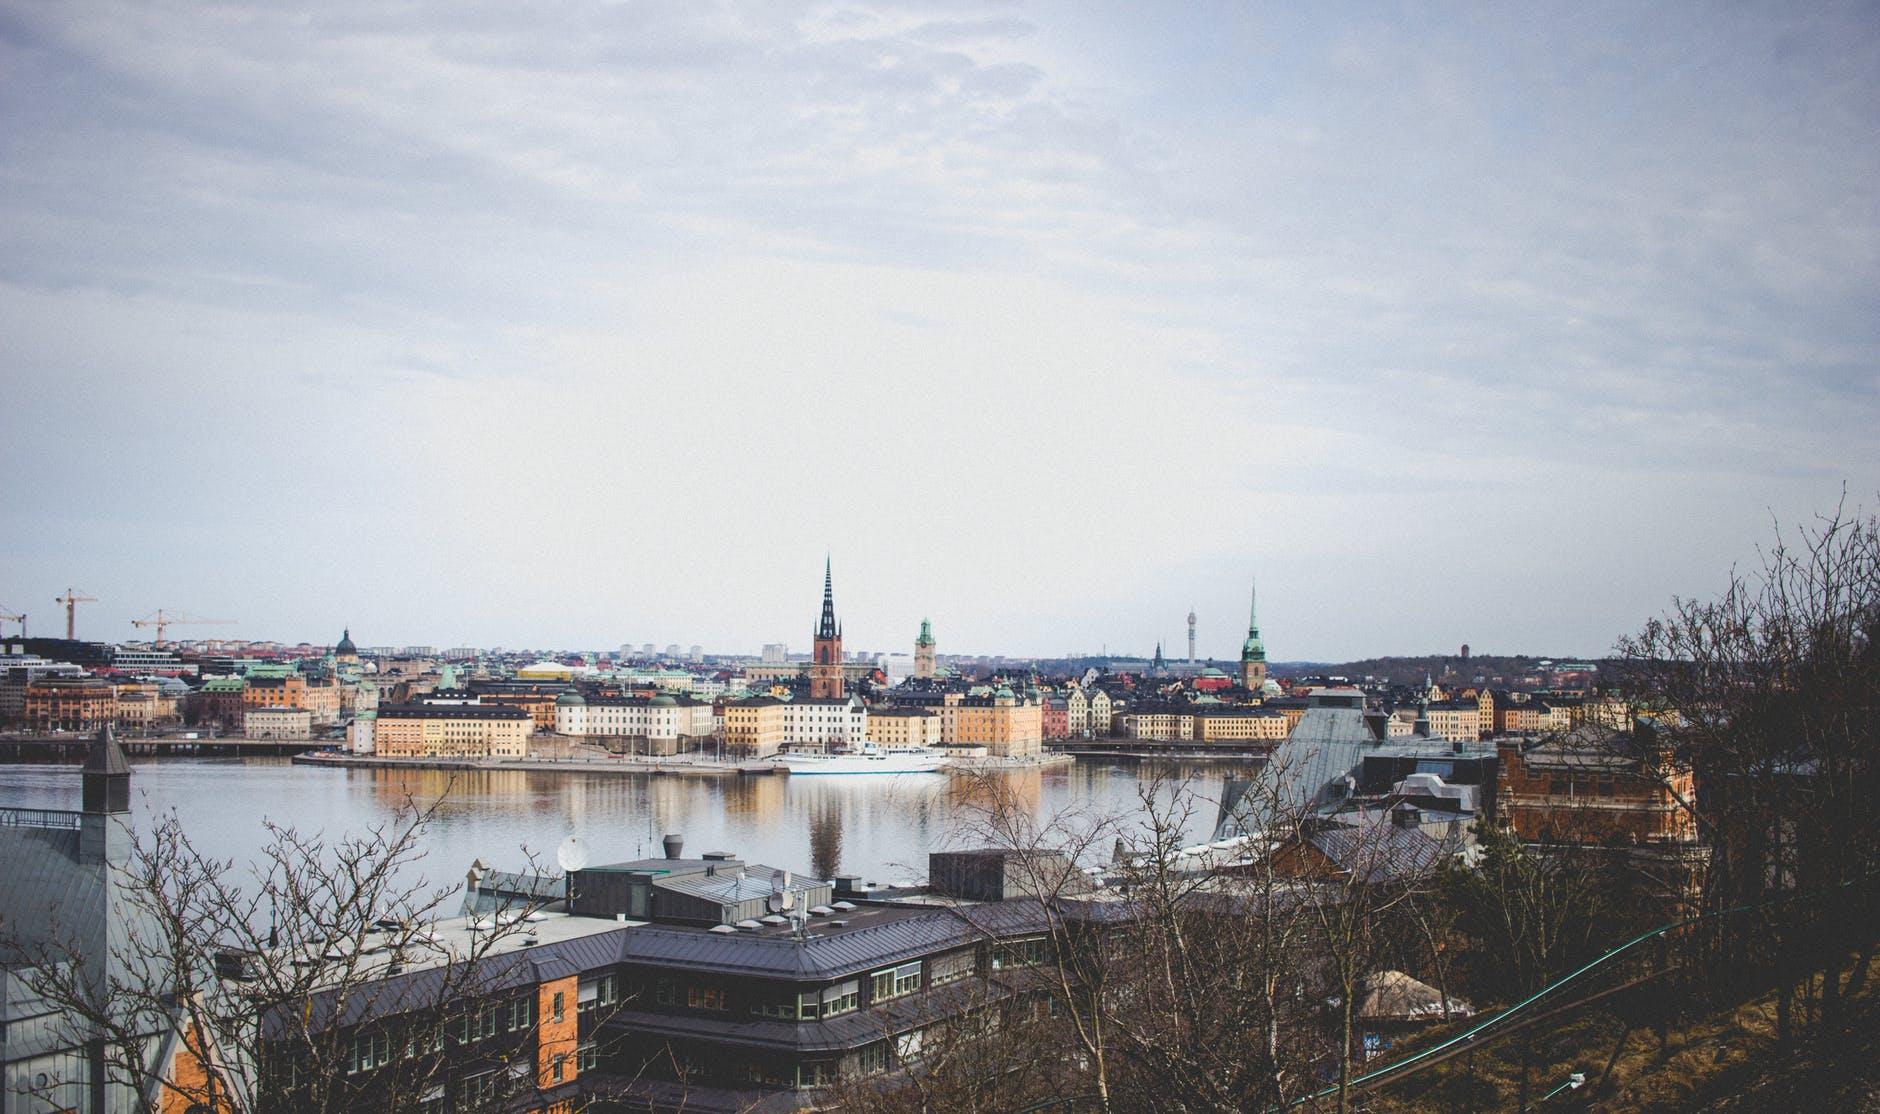 Stoccolma pexels photo